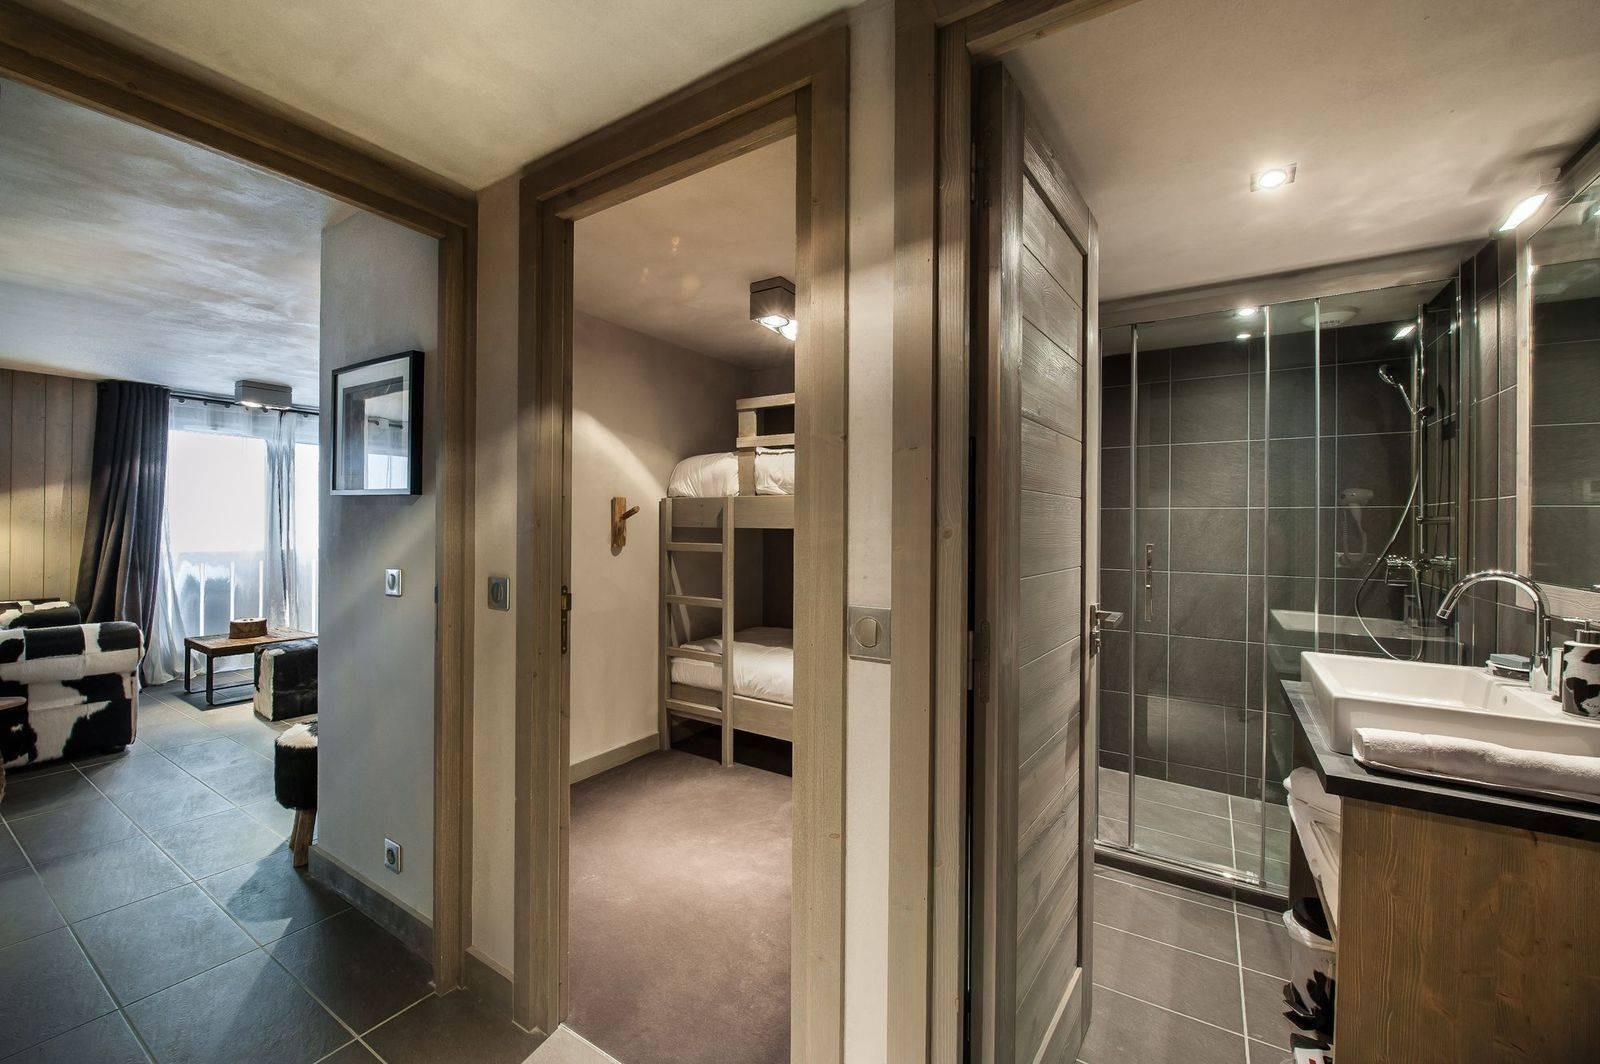 Courchevel 1650 Luxury Rental Appartment Dracali Bathroom